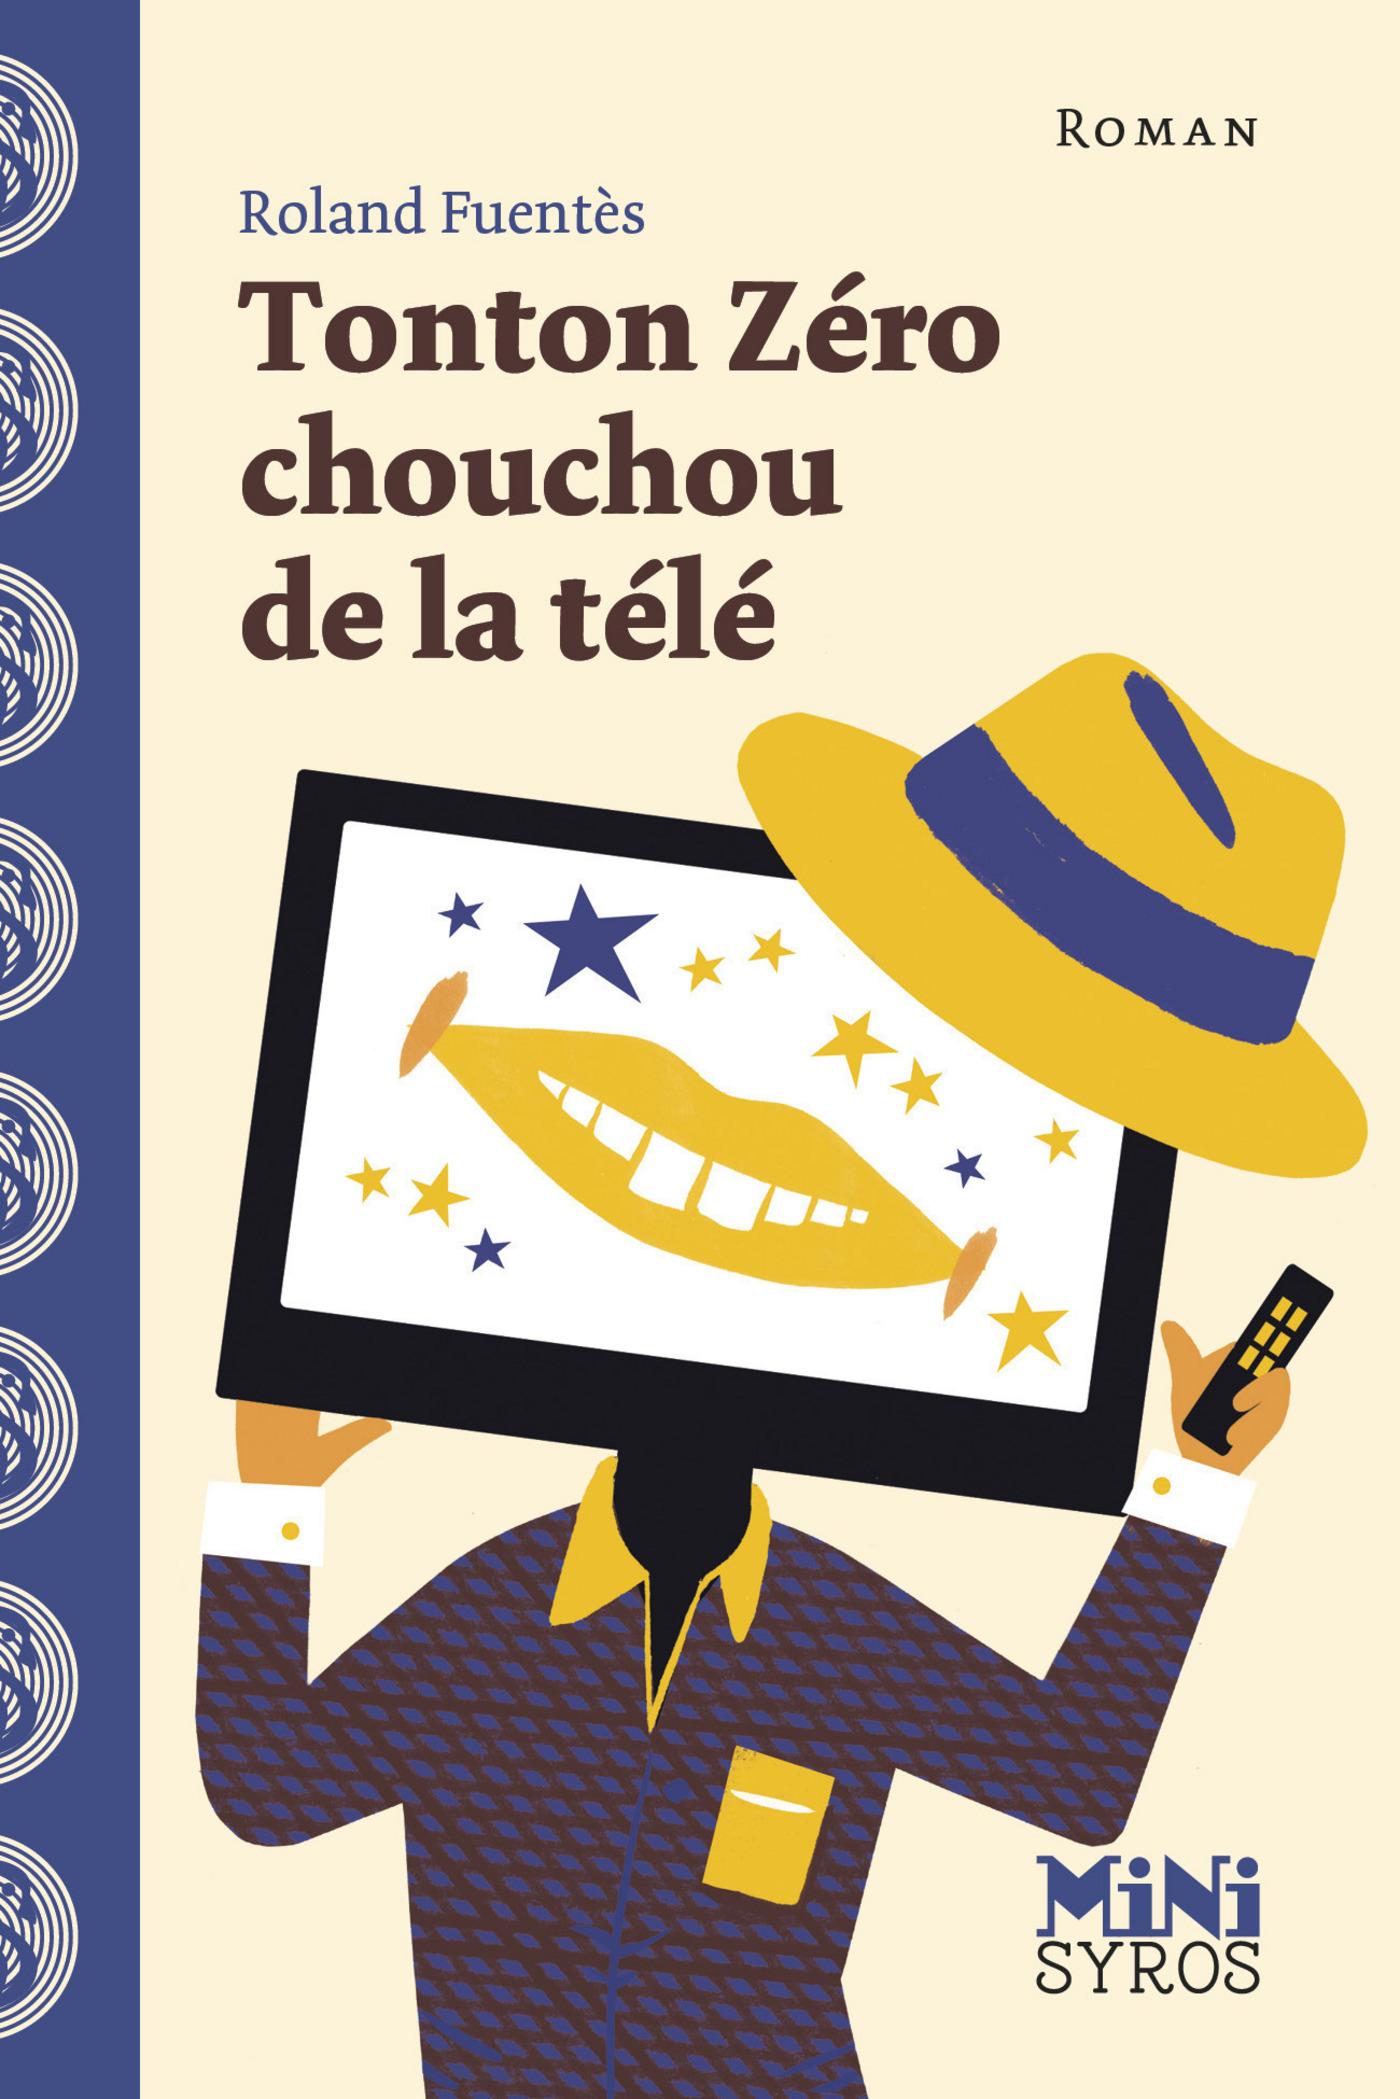 Tonton Zéro chouchou de la télé (ebook)